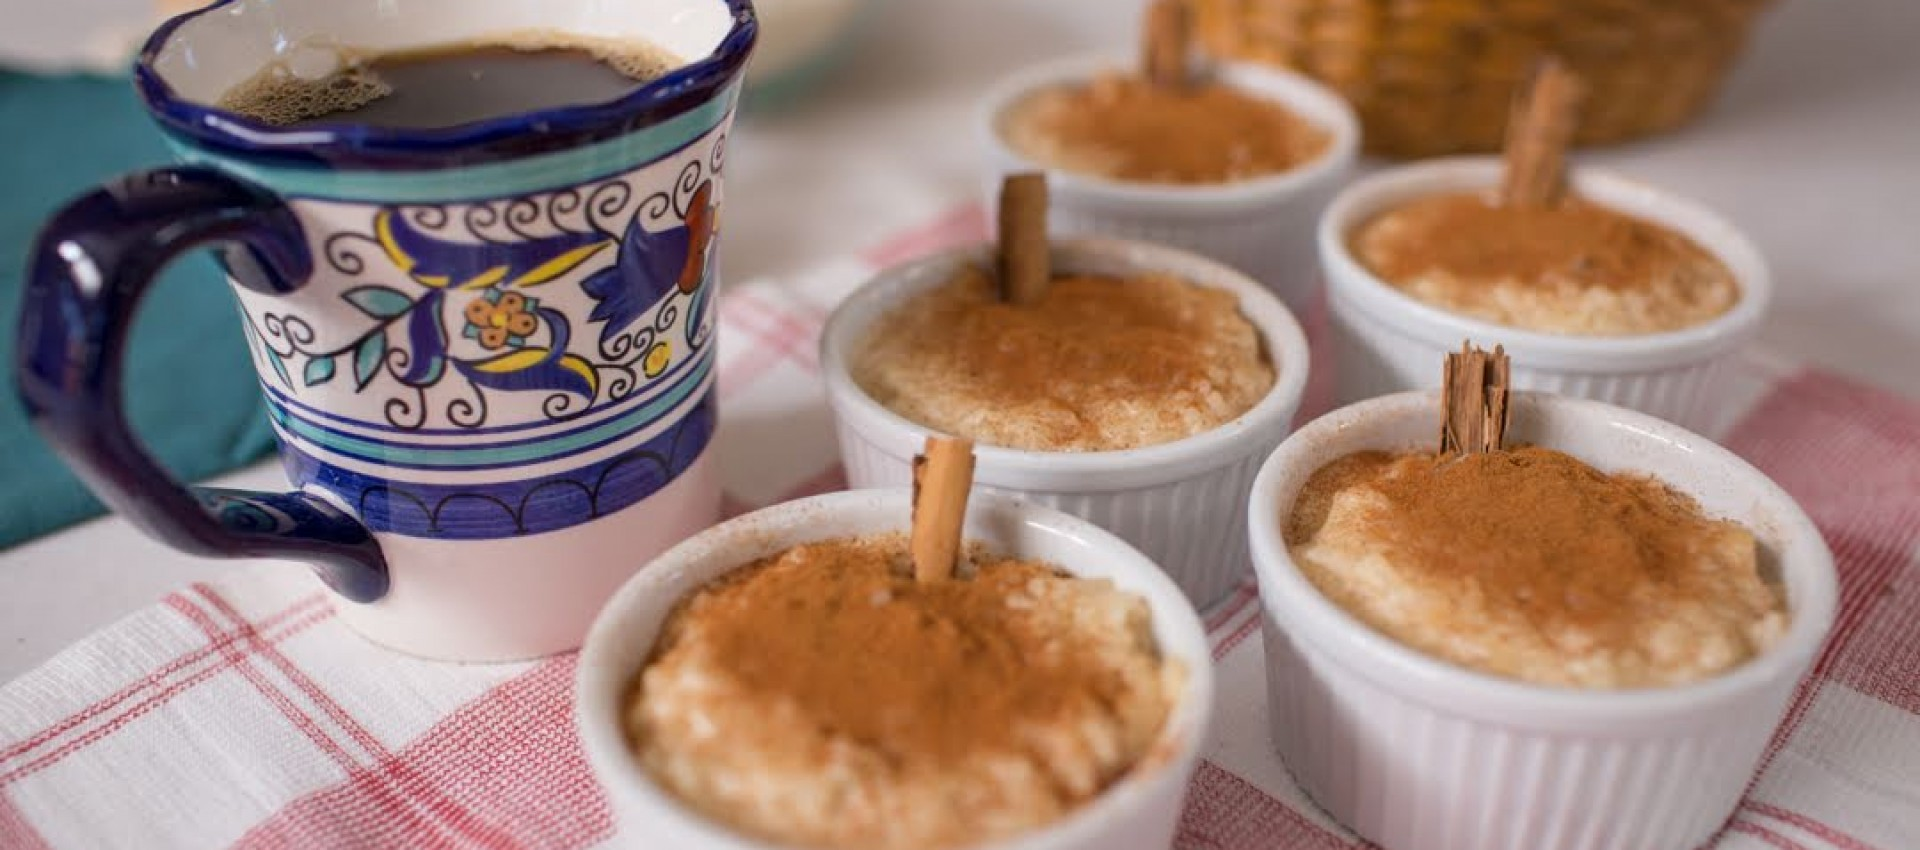 Rice pudding Image